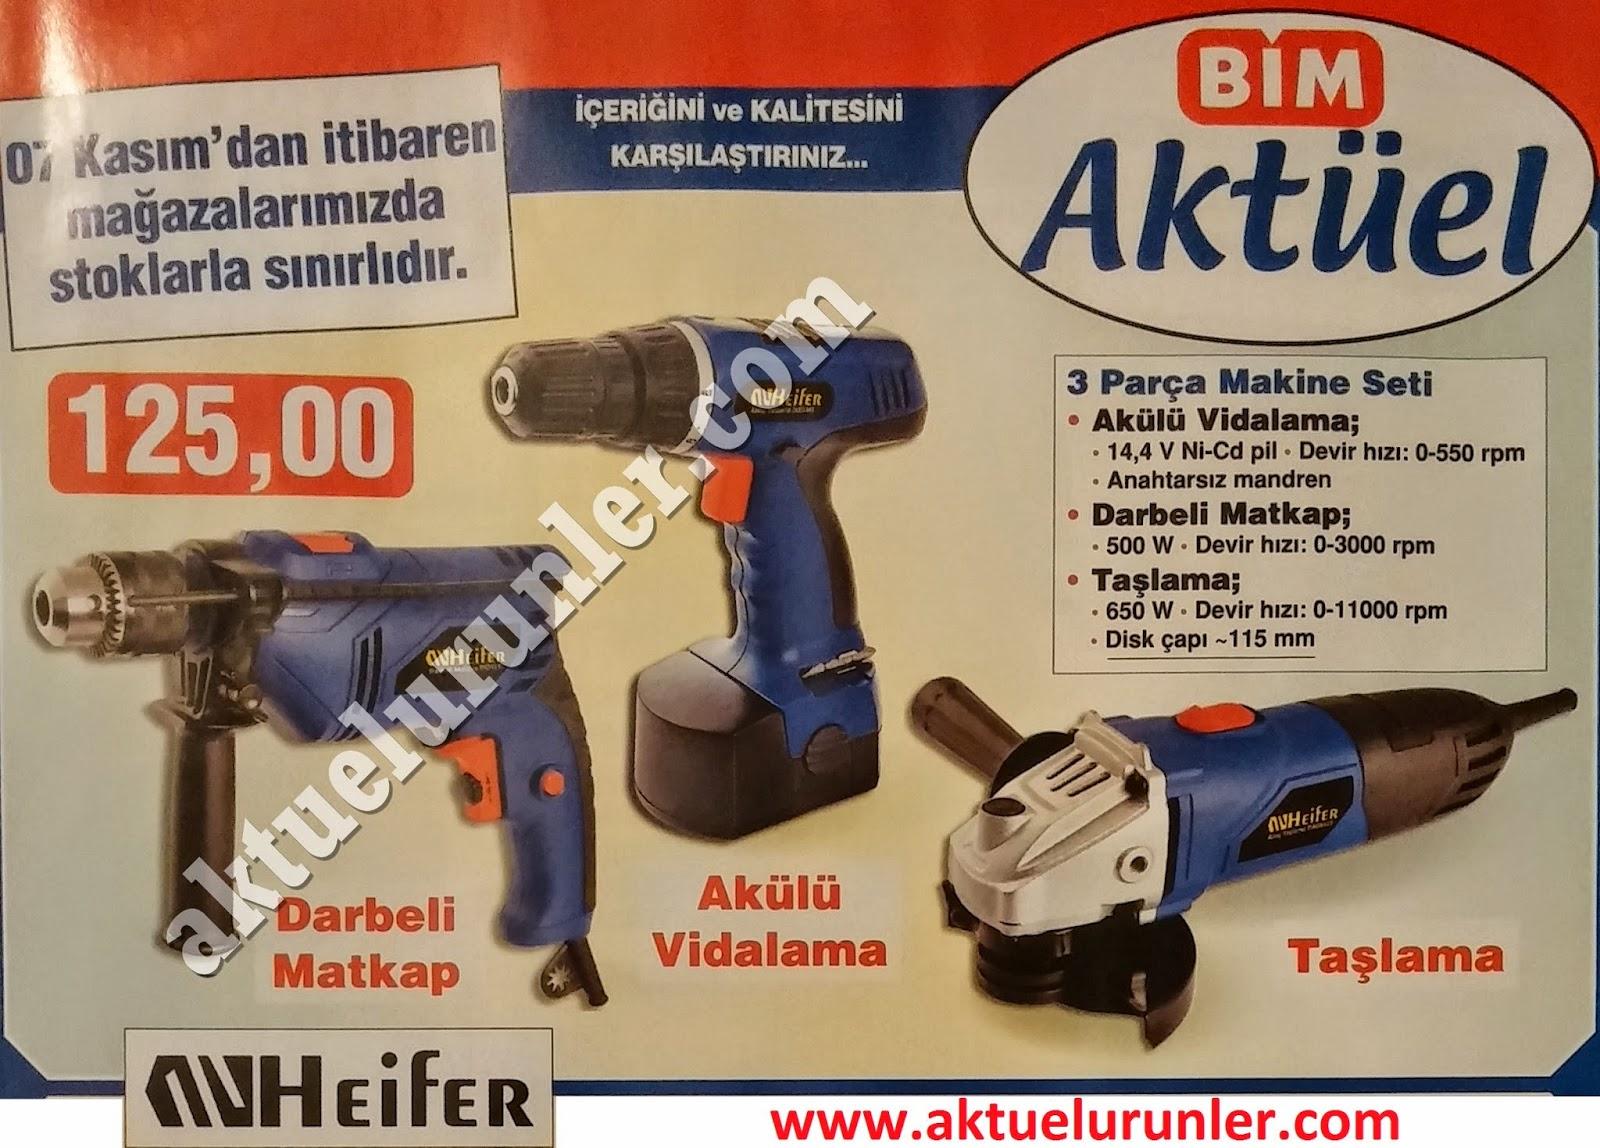 http://www.aktuelurunler.com/p/bim-7-kasm-2014-aktuel-urunler-katalogu.html